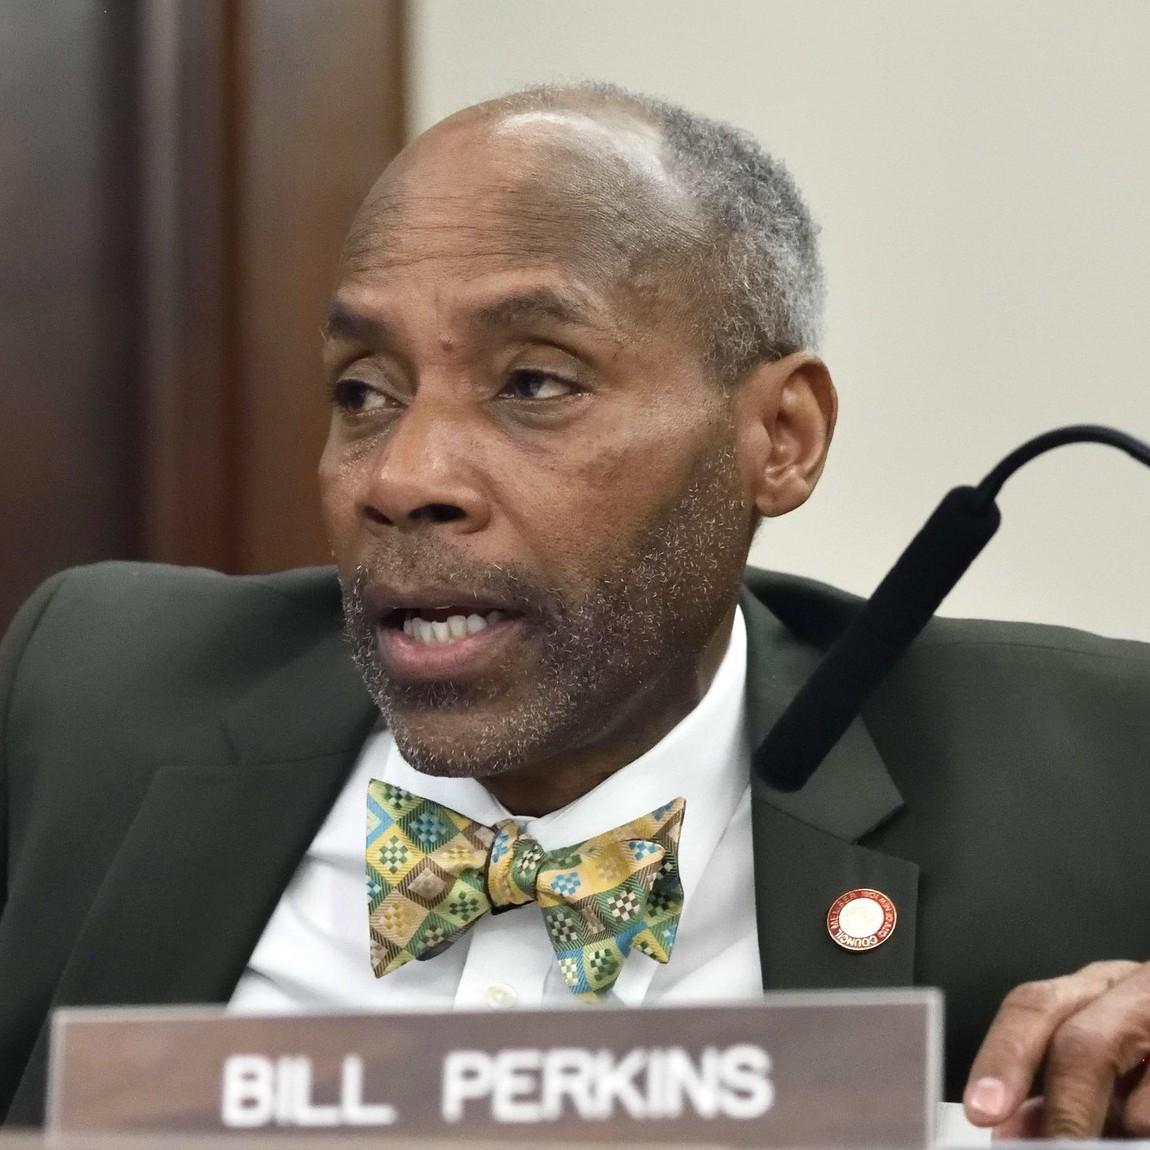 Council Member Bill Perkins